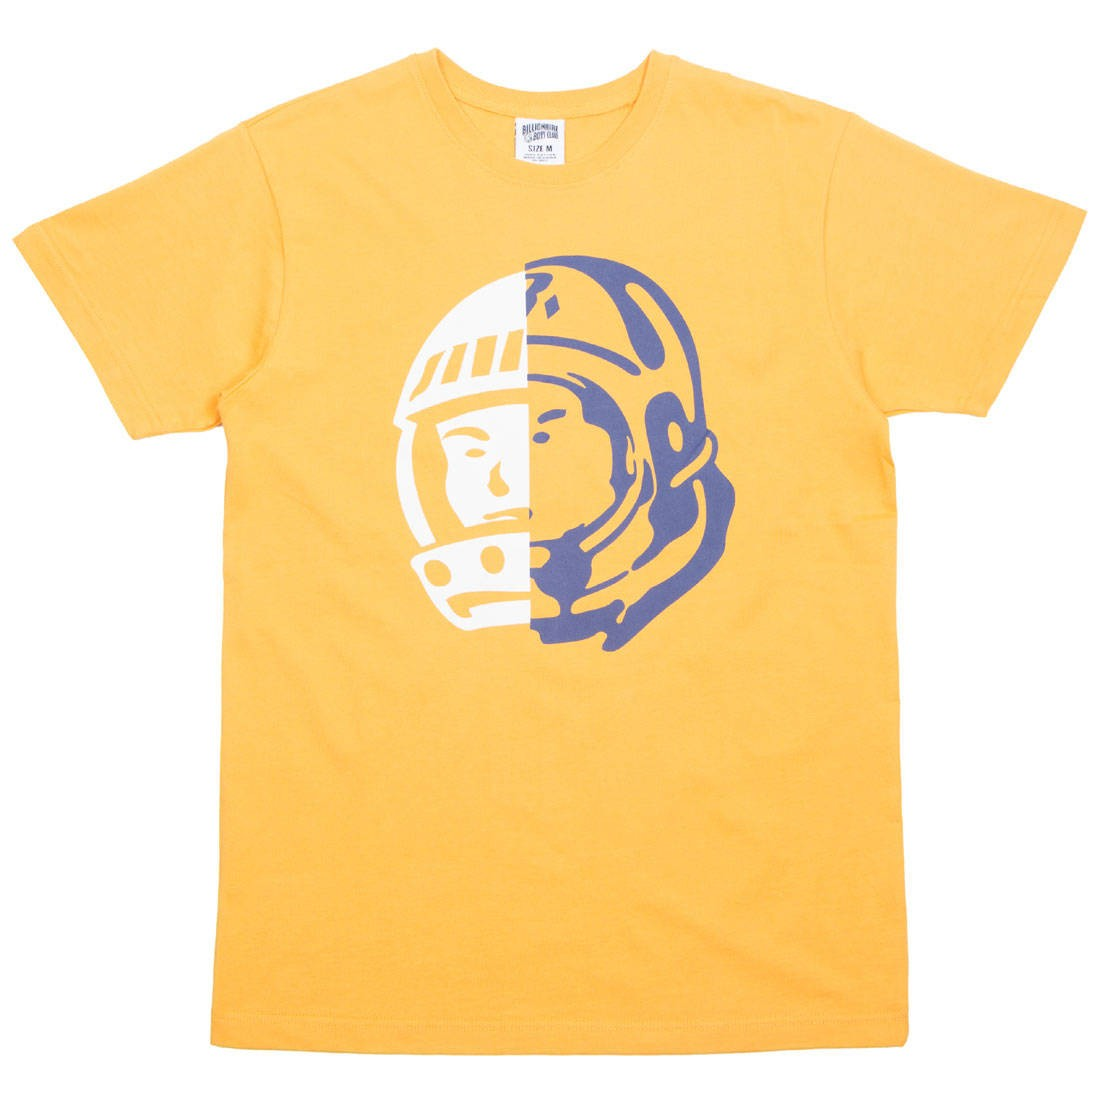 Billionaire Boys Club Men Spacewalk Tee (yellow / beeswax)